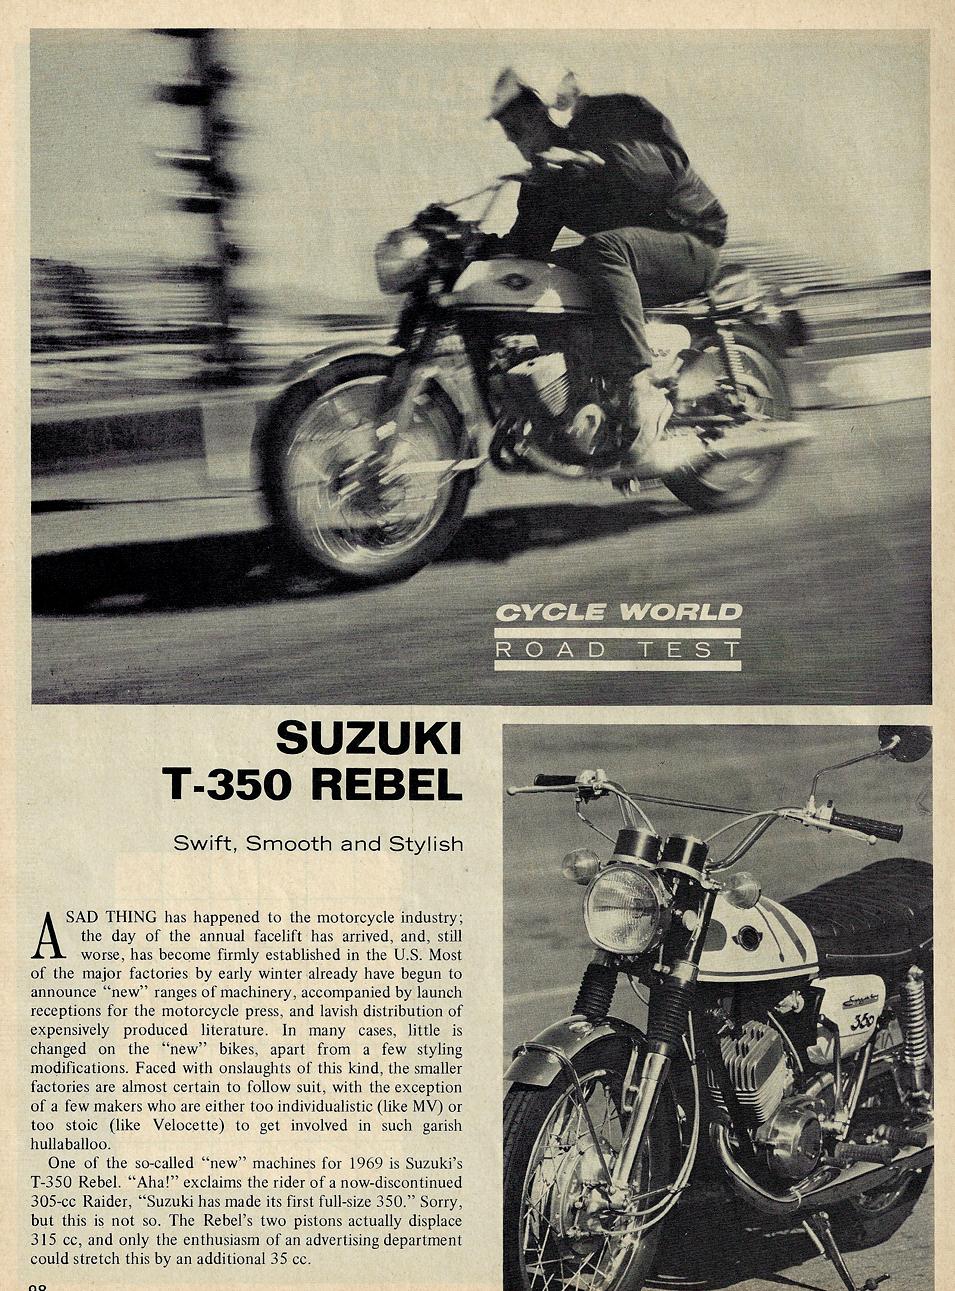 1969 Suzuki T350 Rebel road test 1.jpg